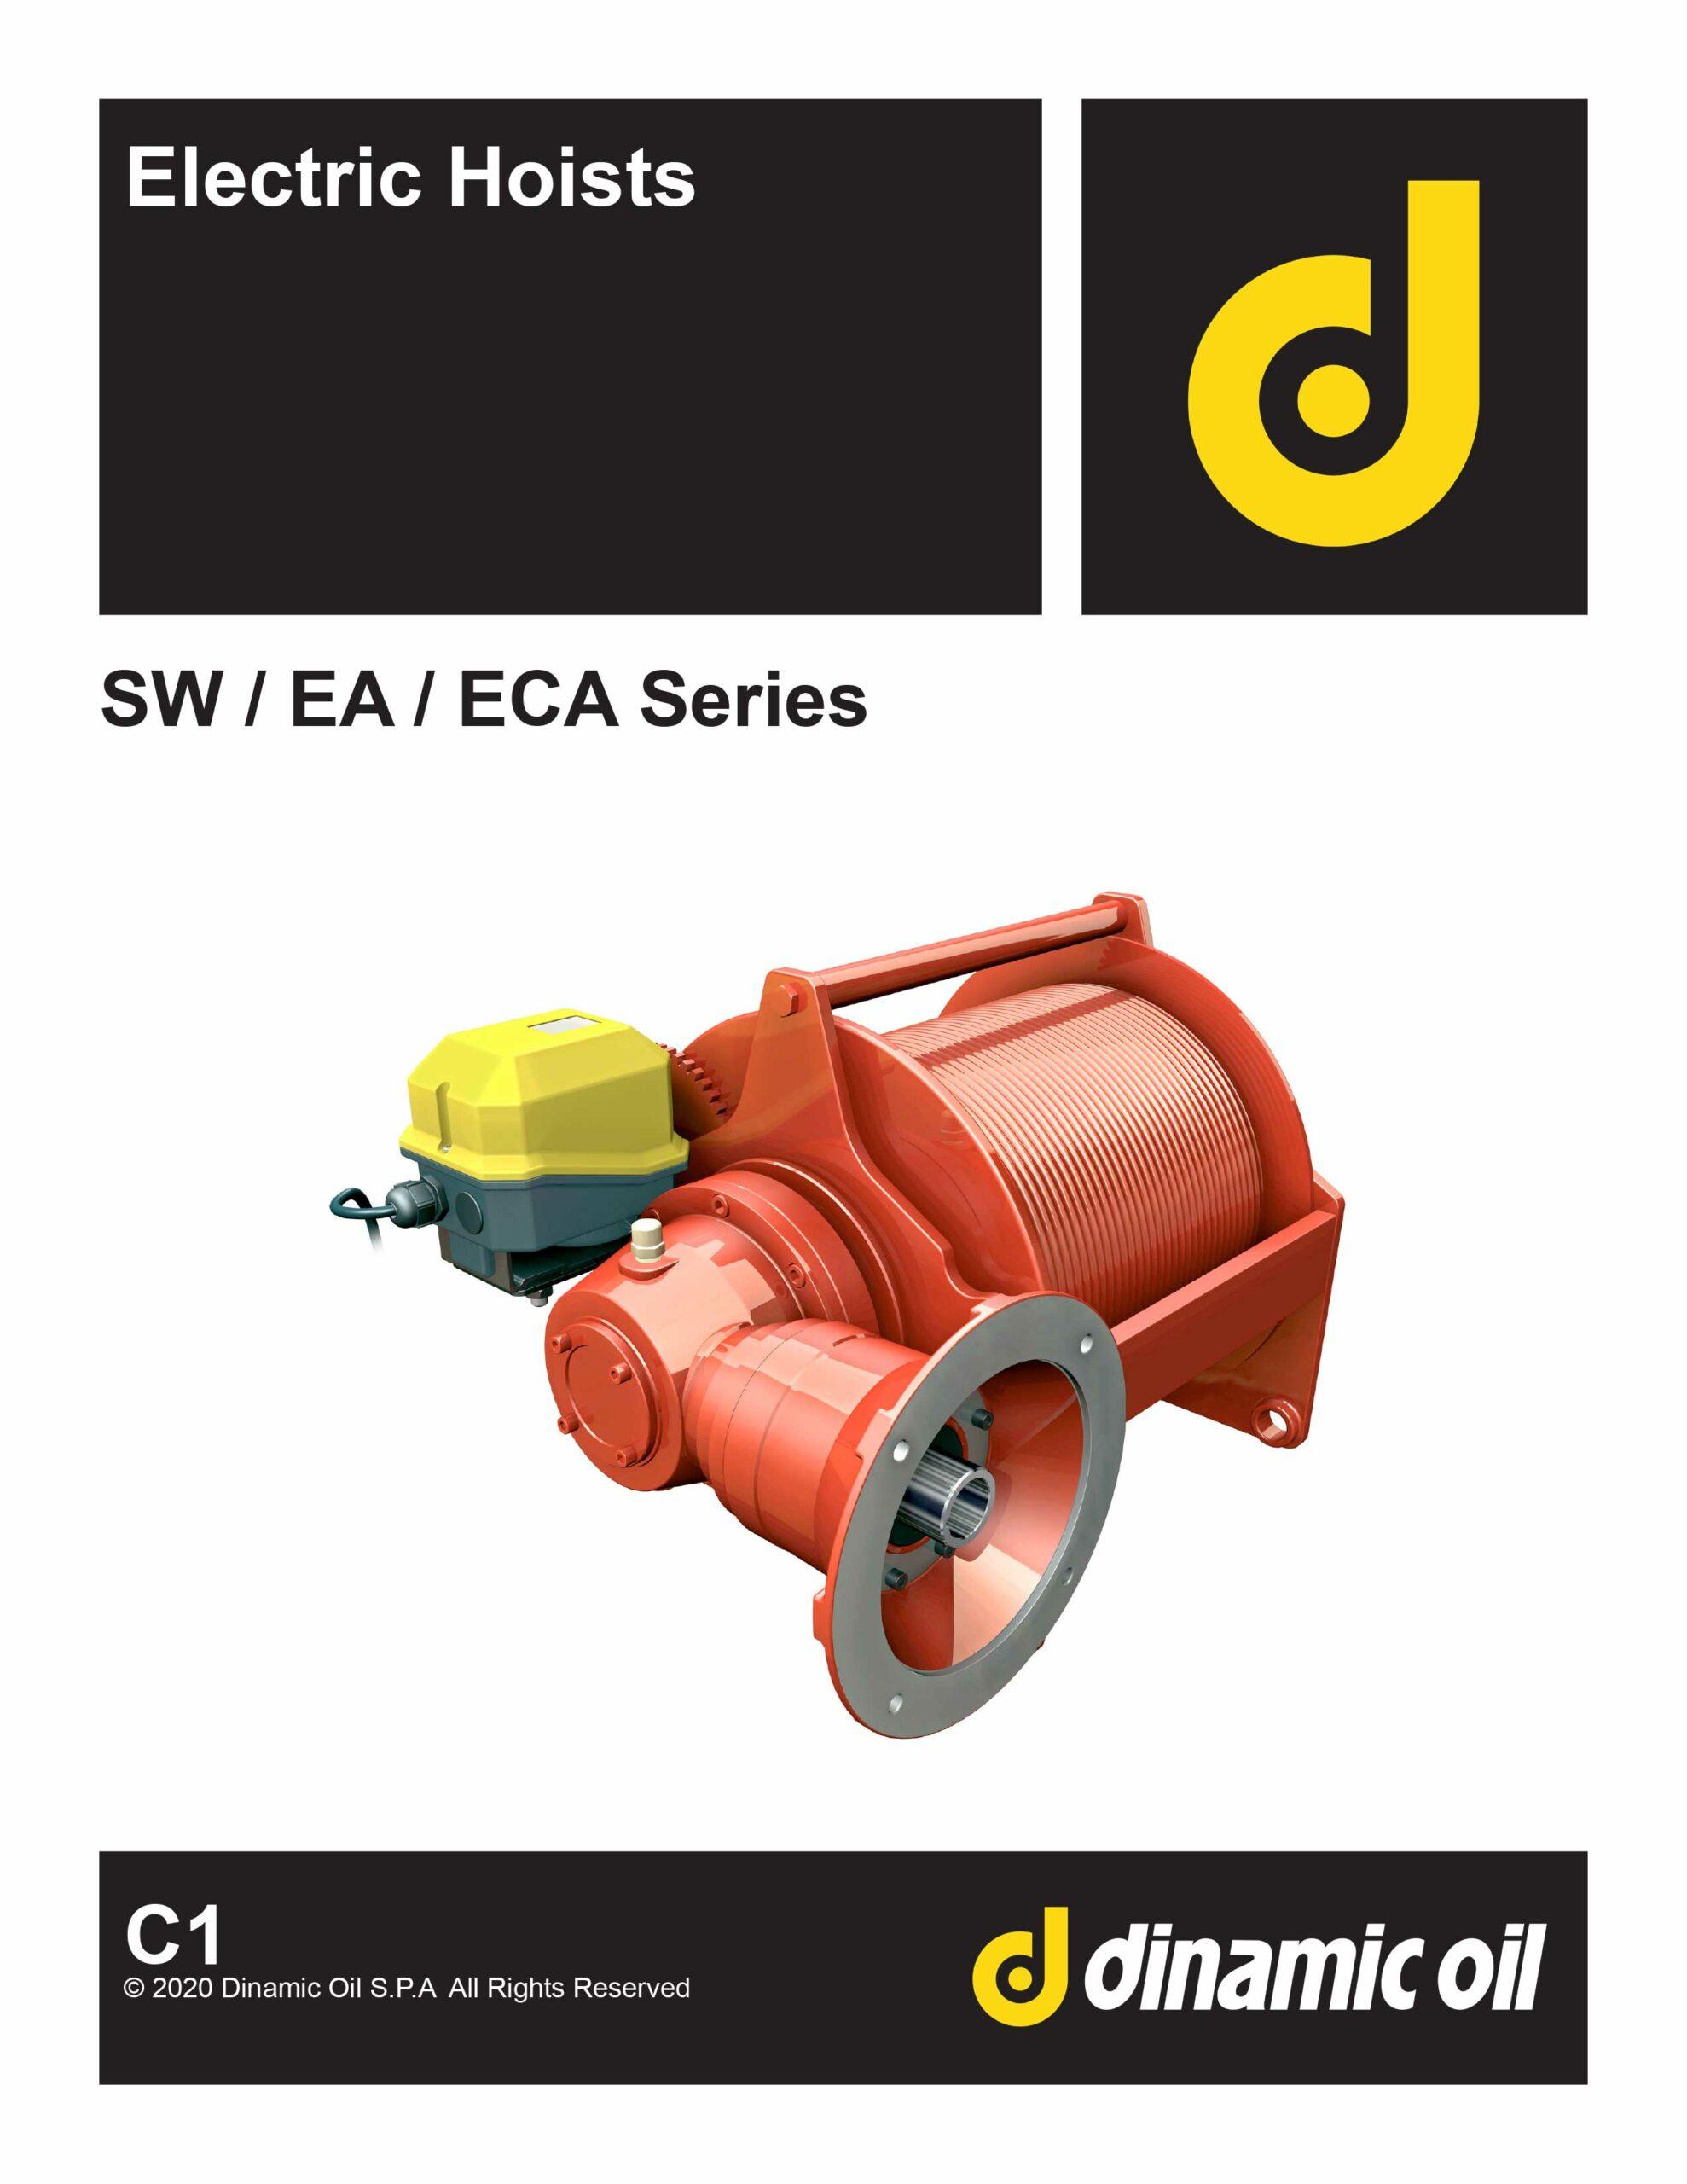 Dinamic Oil Electric Hoist Catalog C1